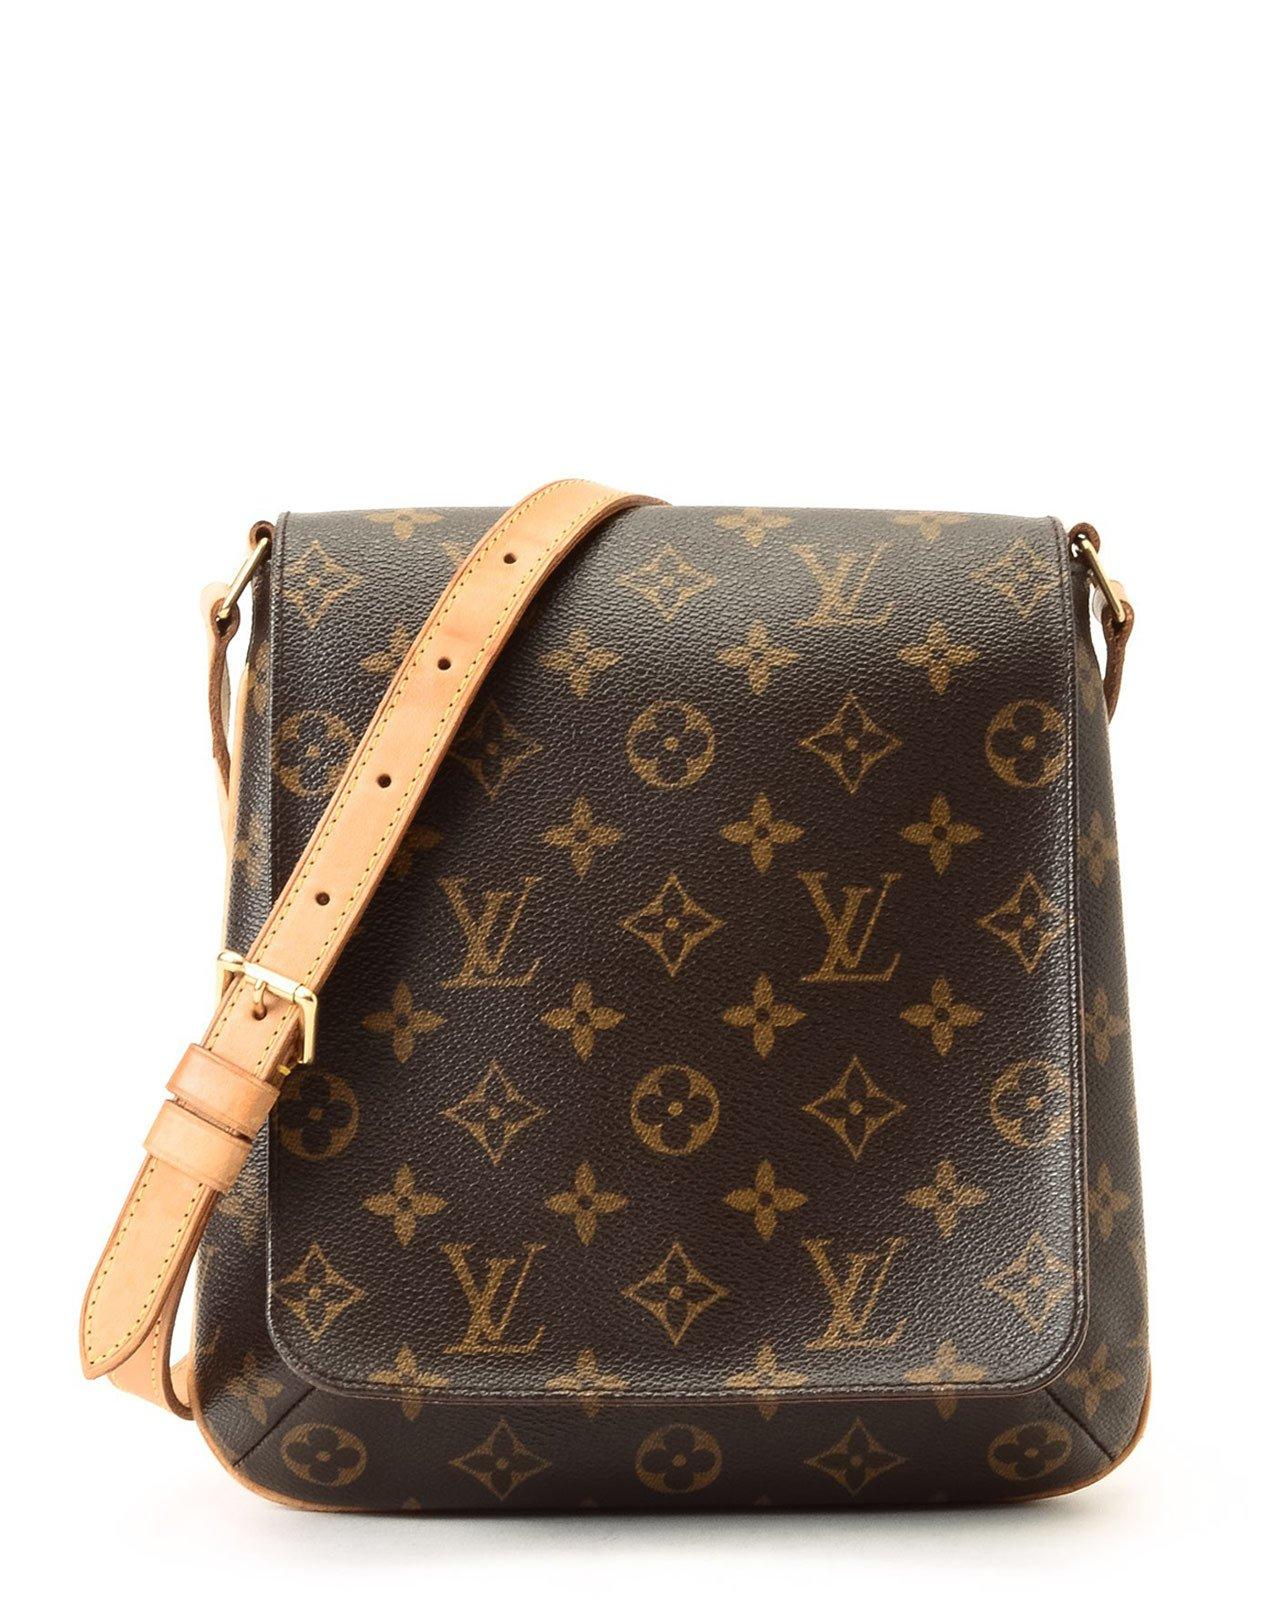 Louis vuitton Musette Salsa Long Strap Shoulder Bag in Brown | Lyst